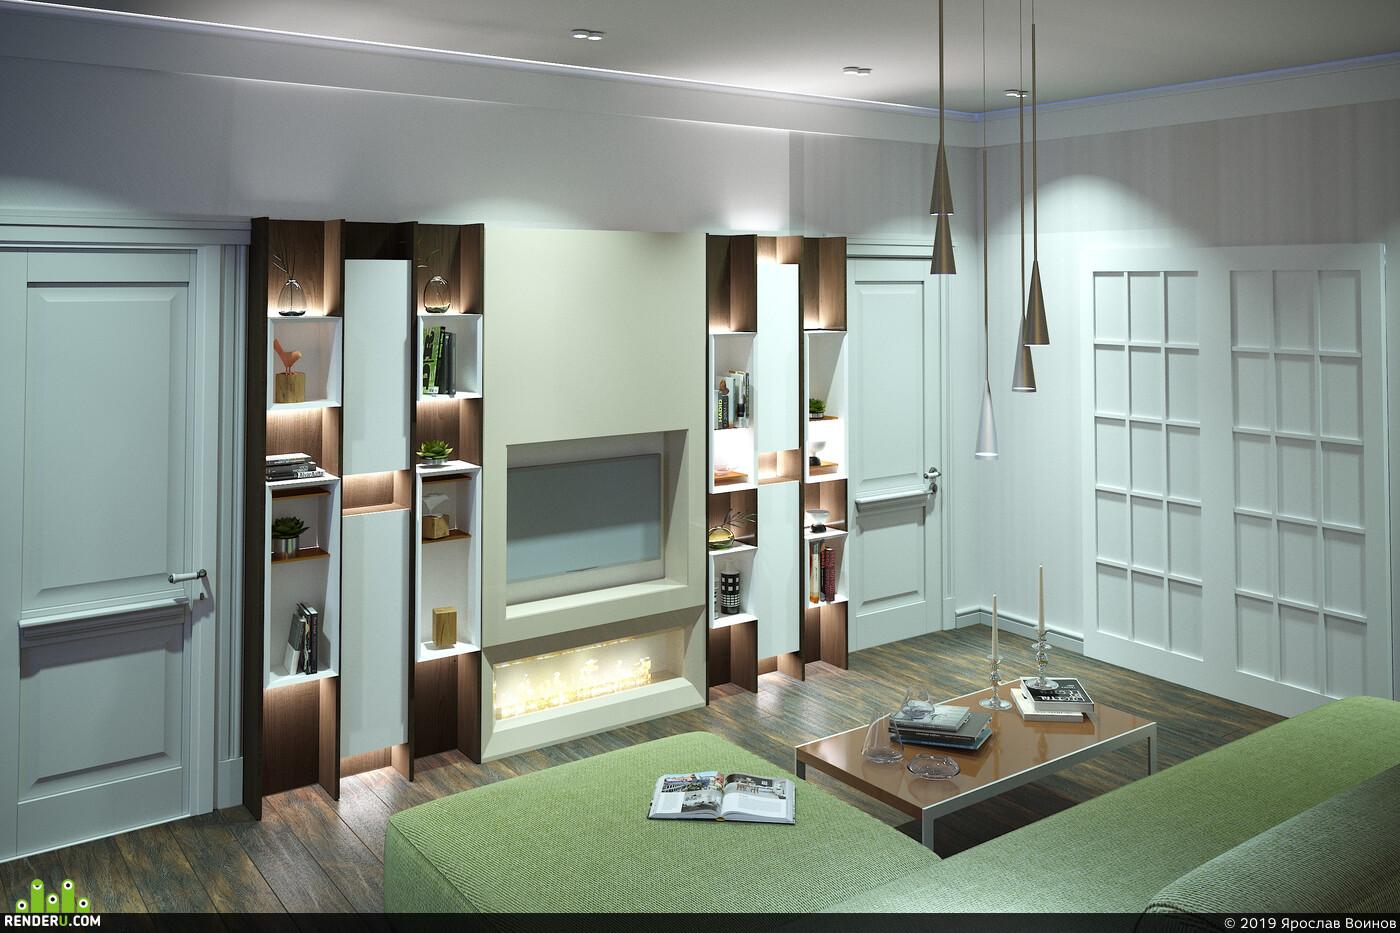 rendering, interior, interior design, Interior Decor, 3dmodels, Corona Renderer, model, Autodesk, design_character